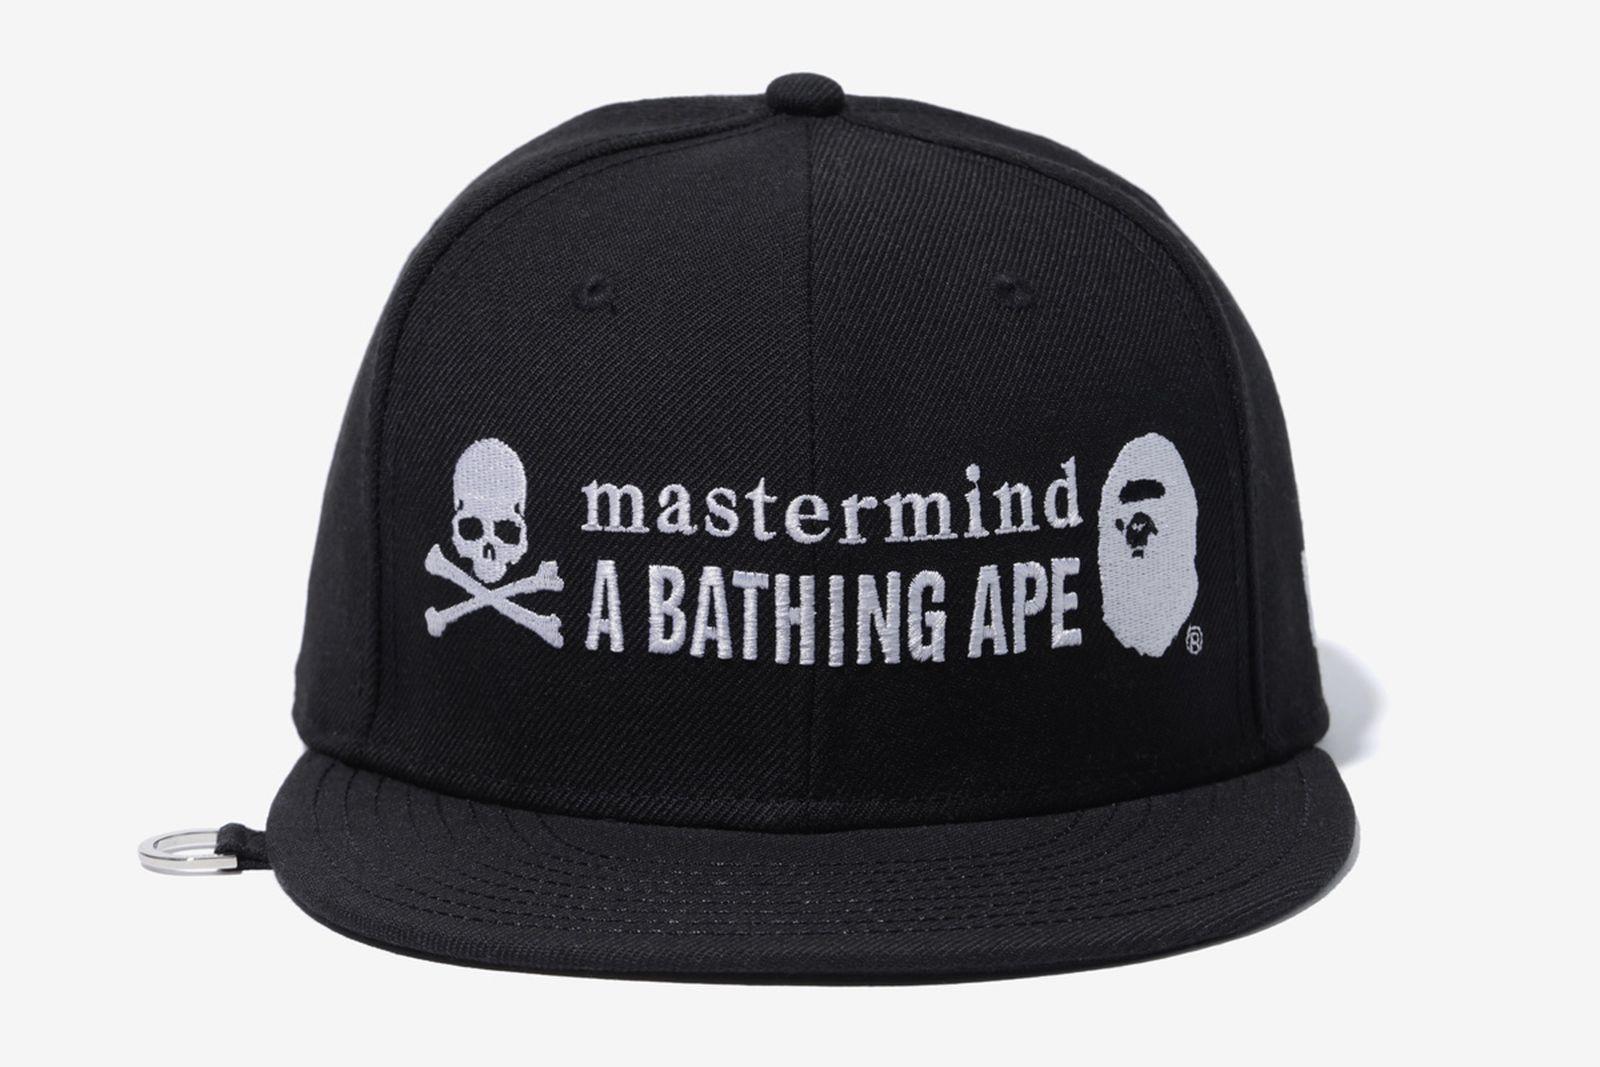 mastermind A BATHING APE bape mastermind japan